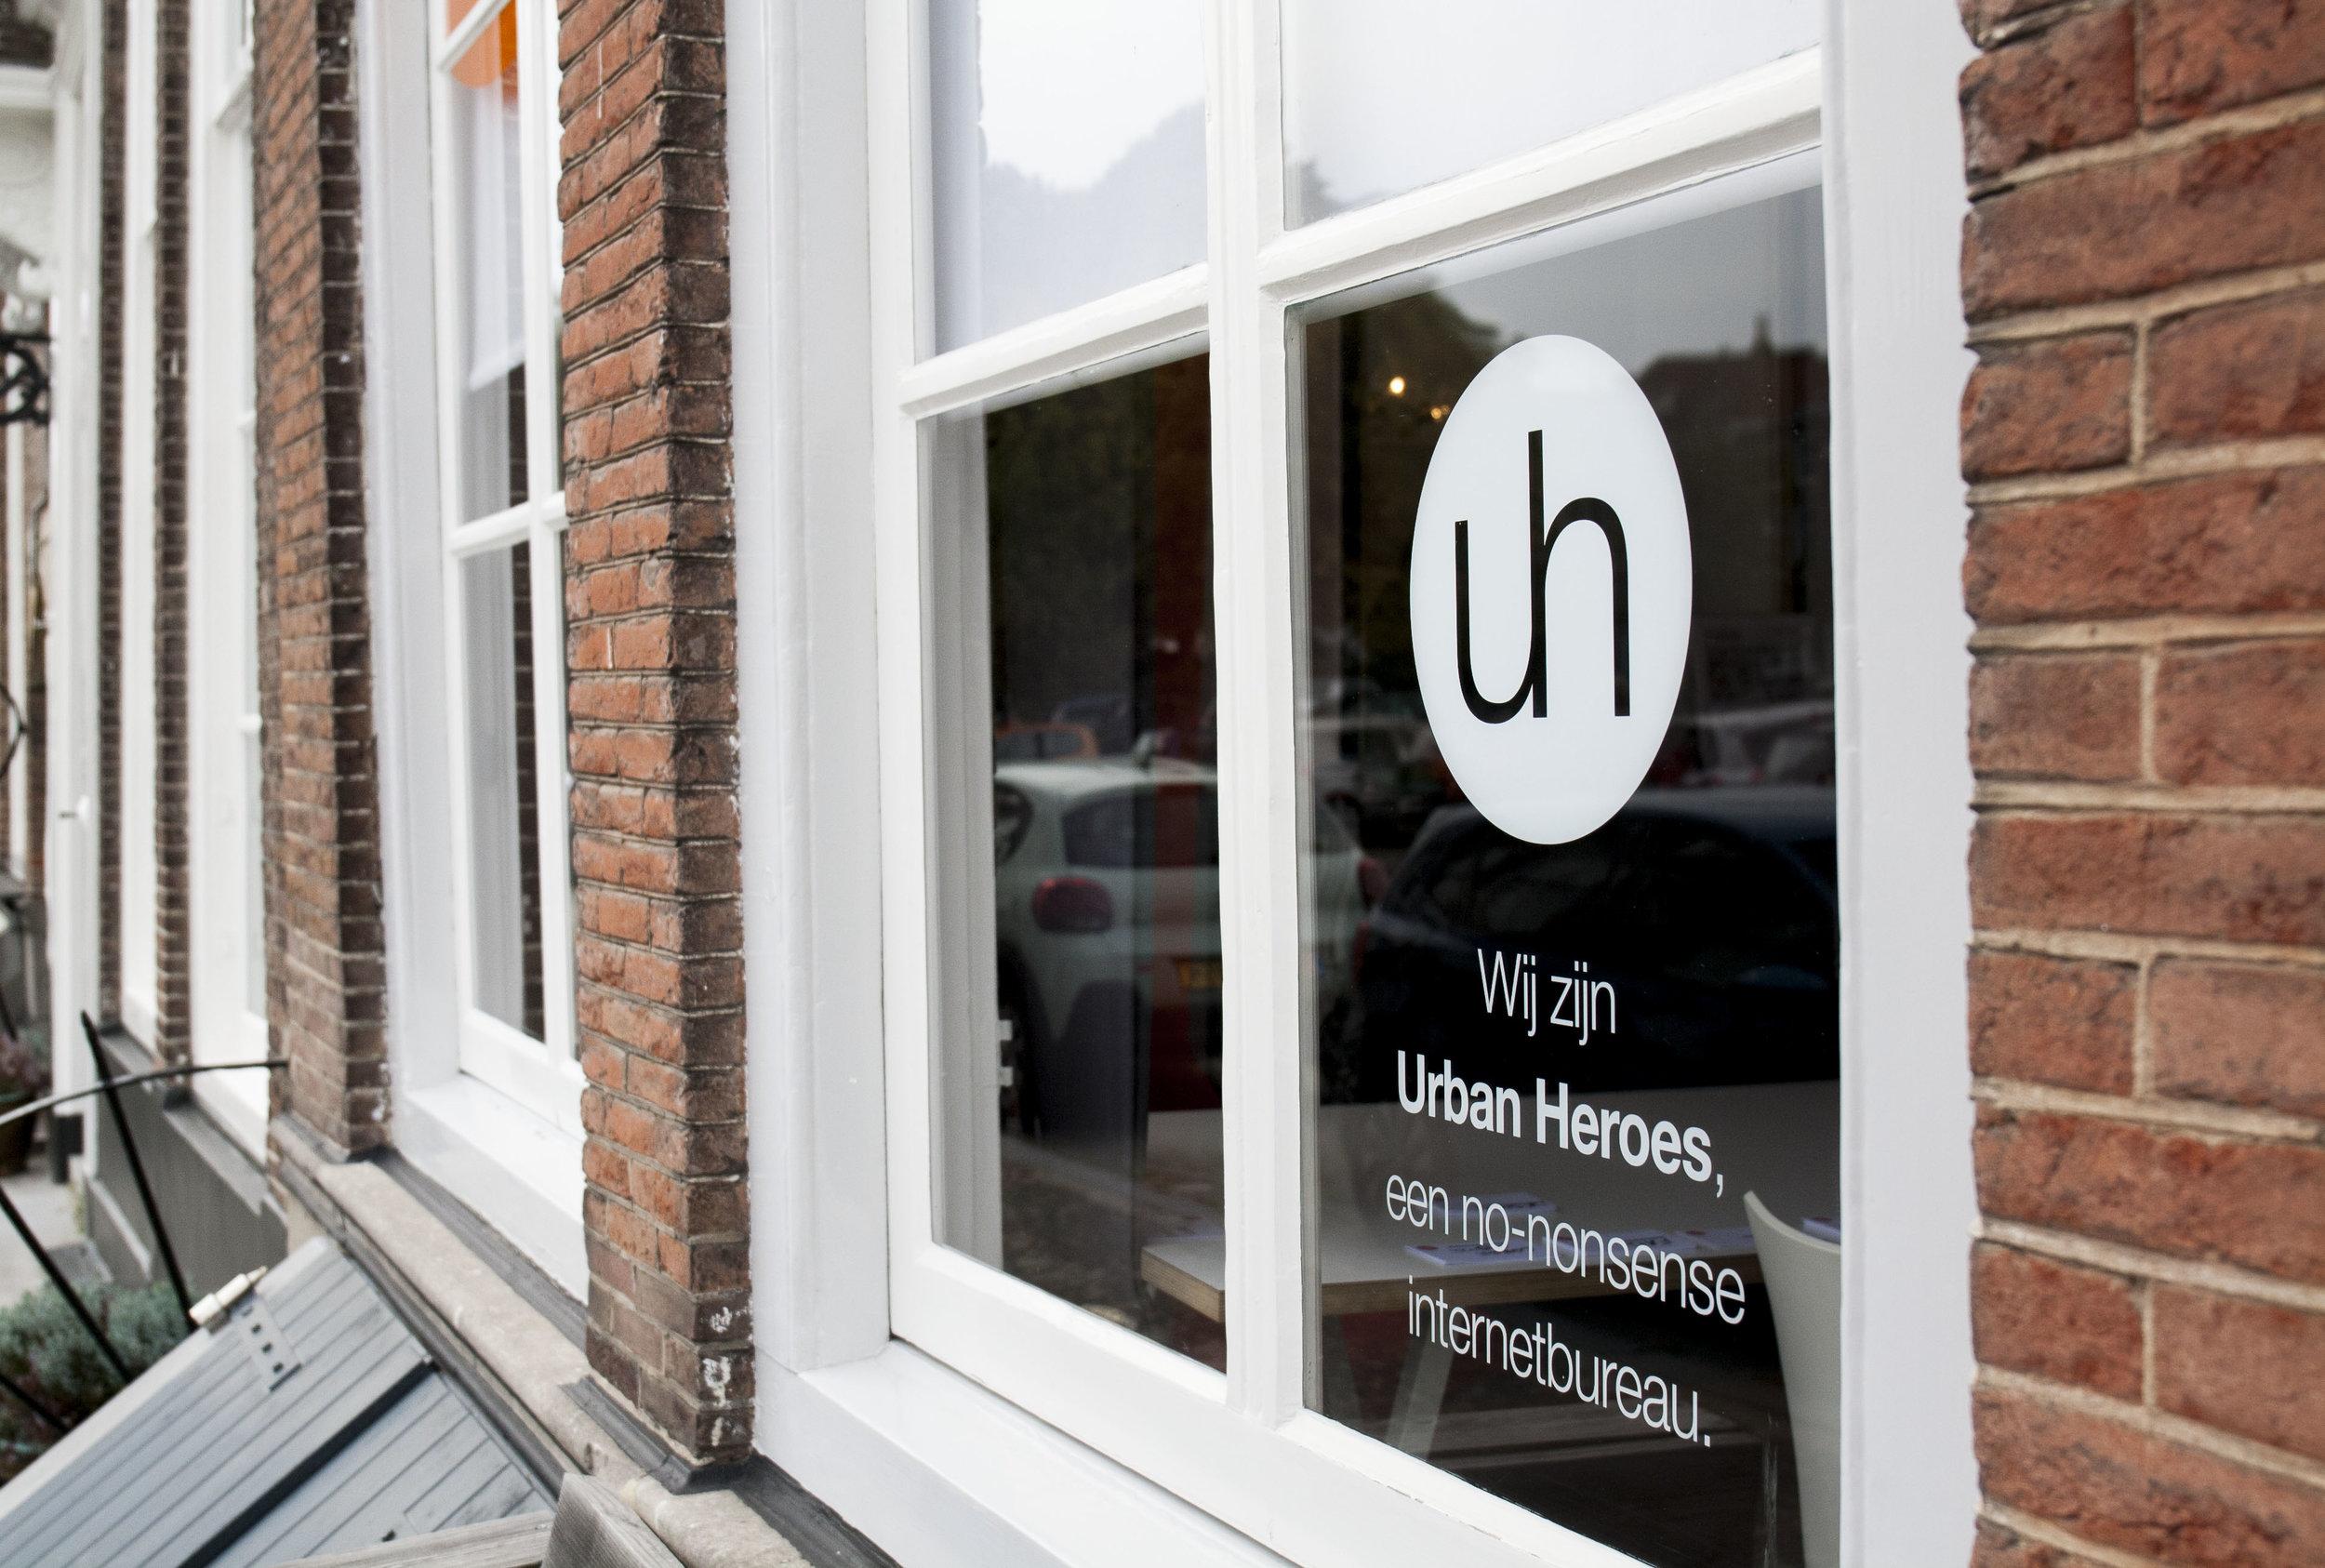 Urban-heroes-internetbureau-middelburg-IMG_2144.JPG